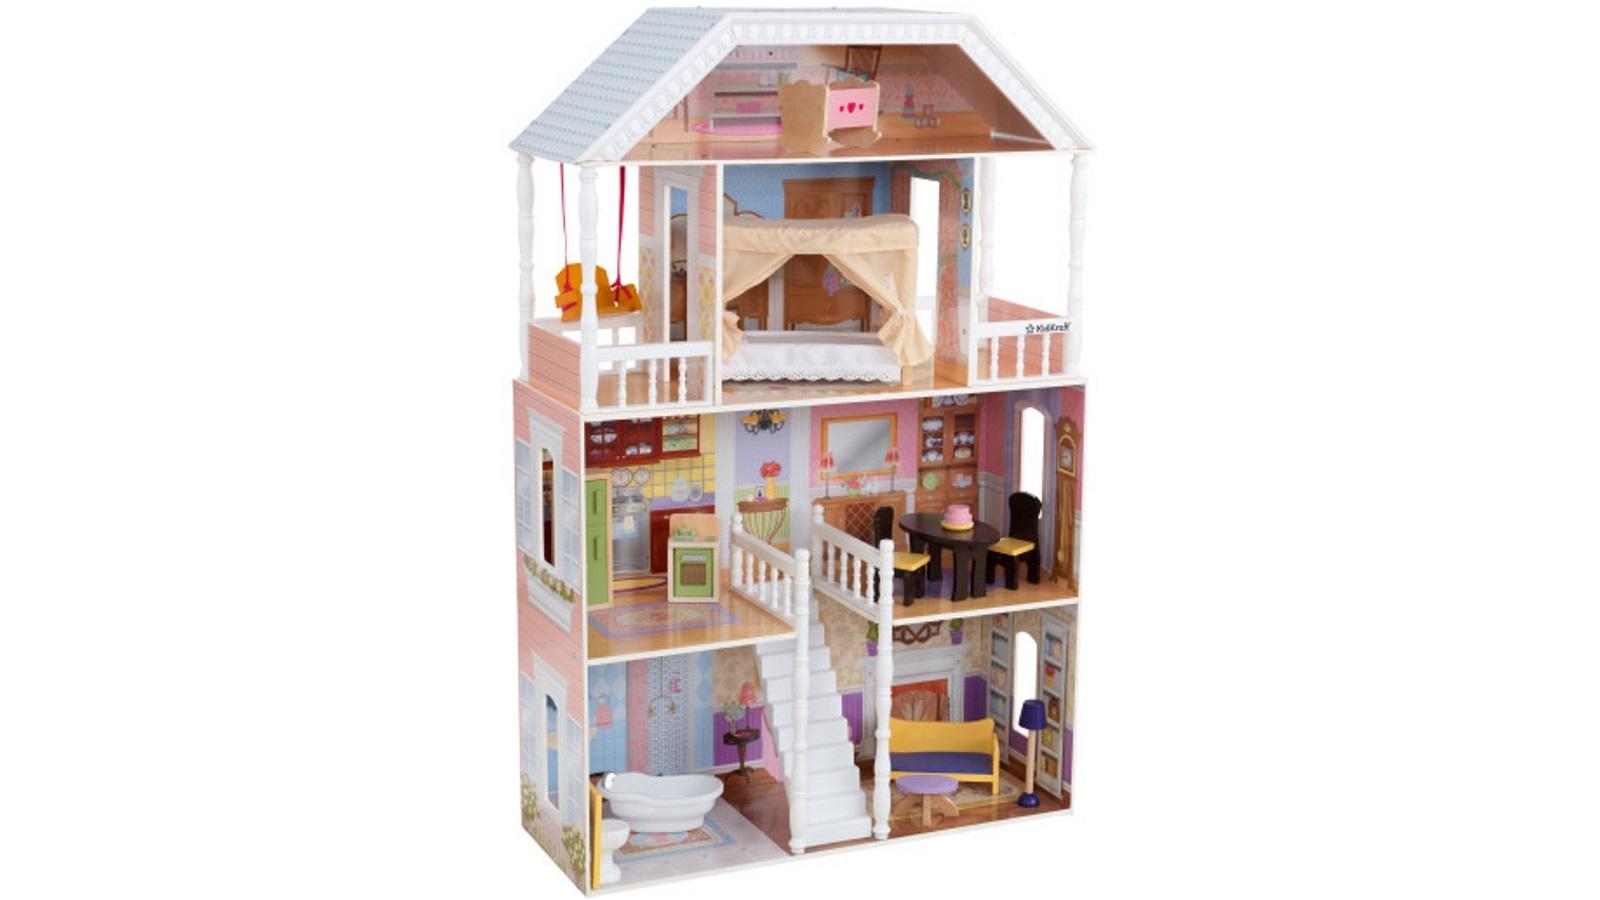 Image of Kidkraft Savannah Dollhouse